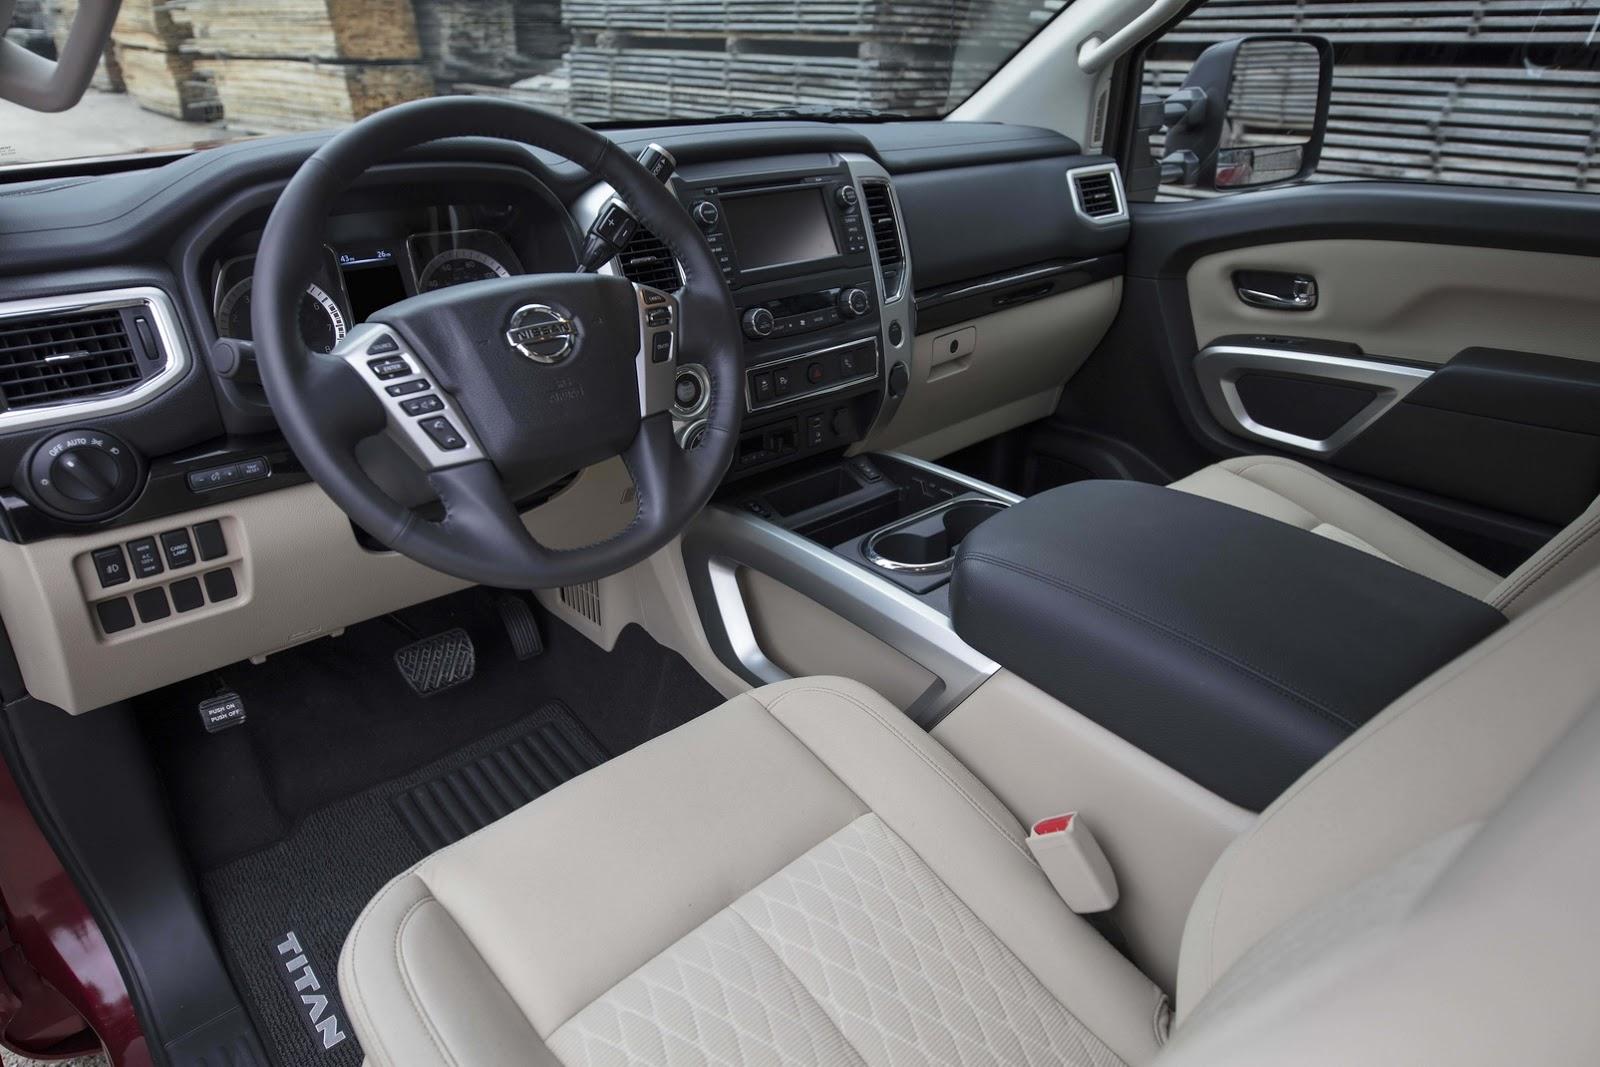 Nissan Titan King Cab 2017 (14)